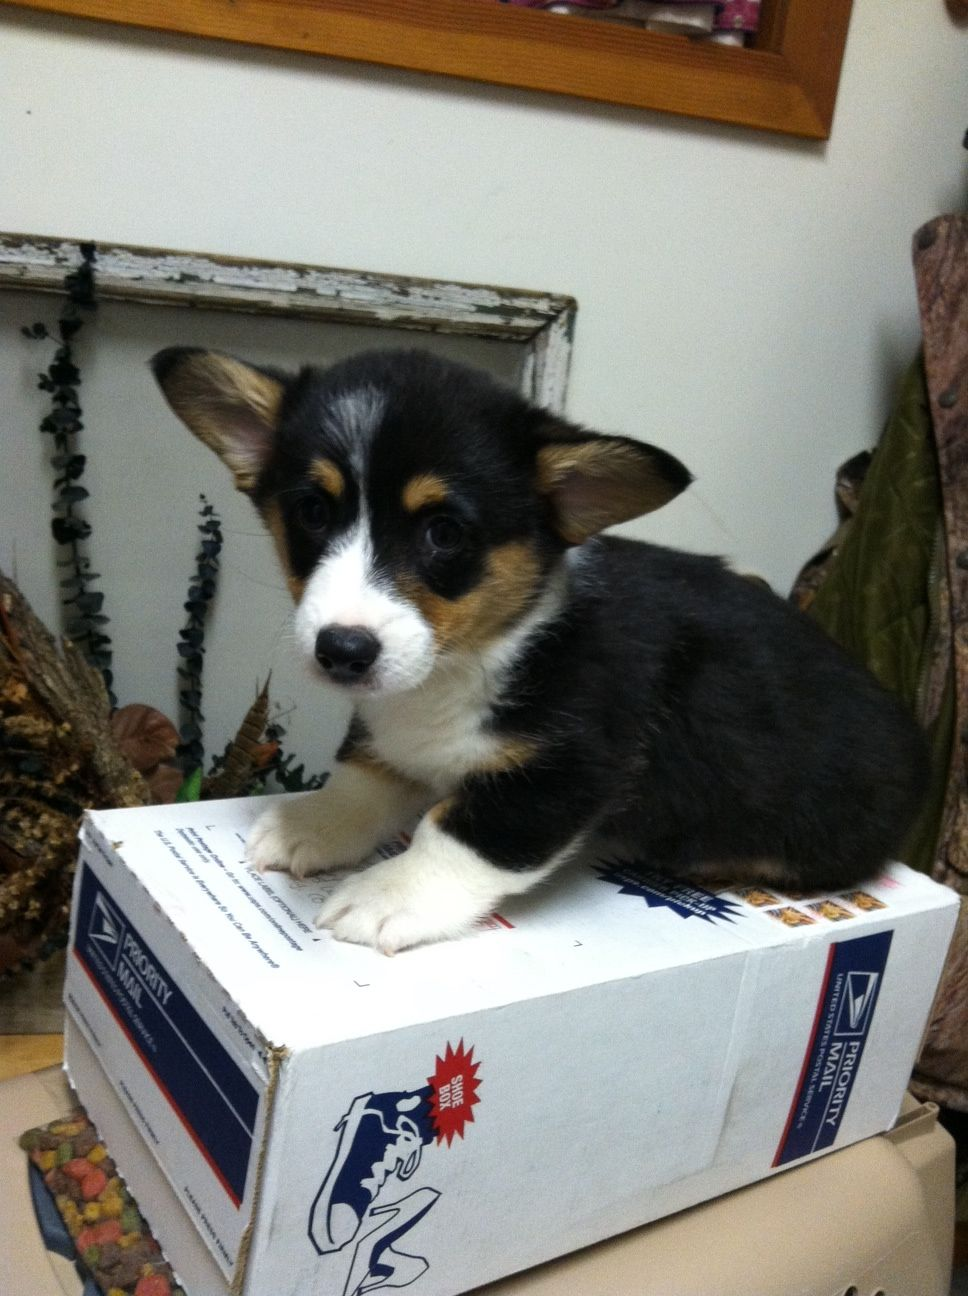 If I sits... I ship? http://ift.tt/2r8uEgY